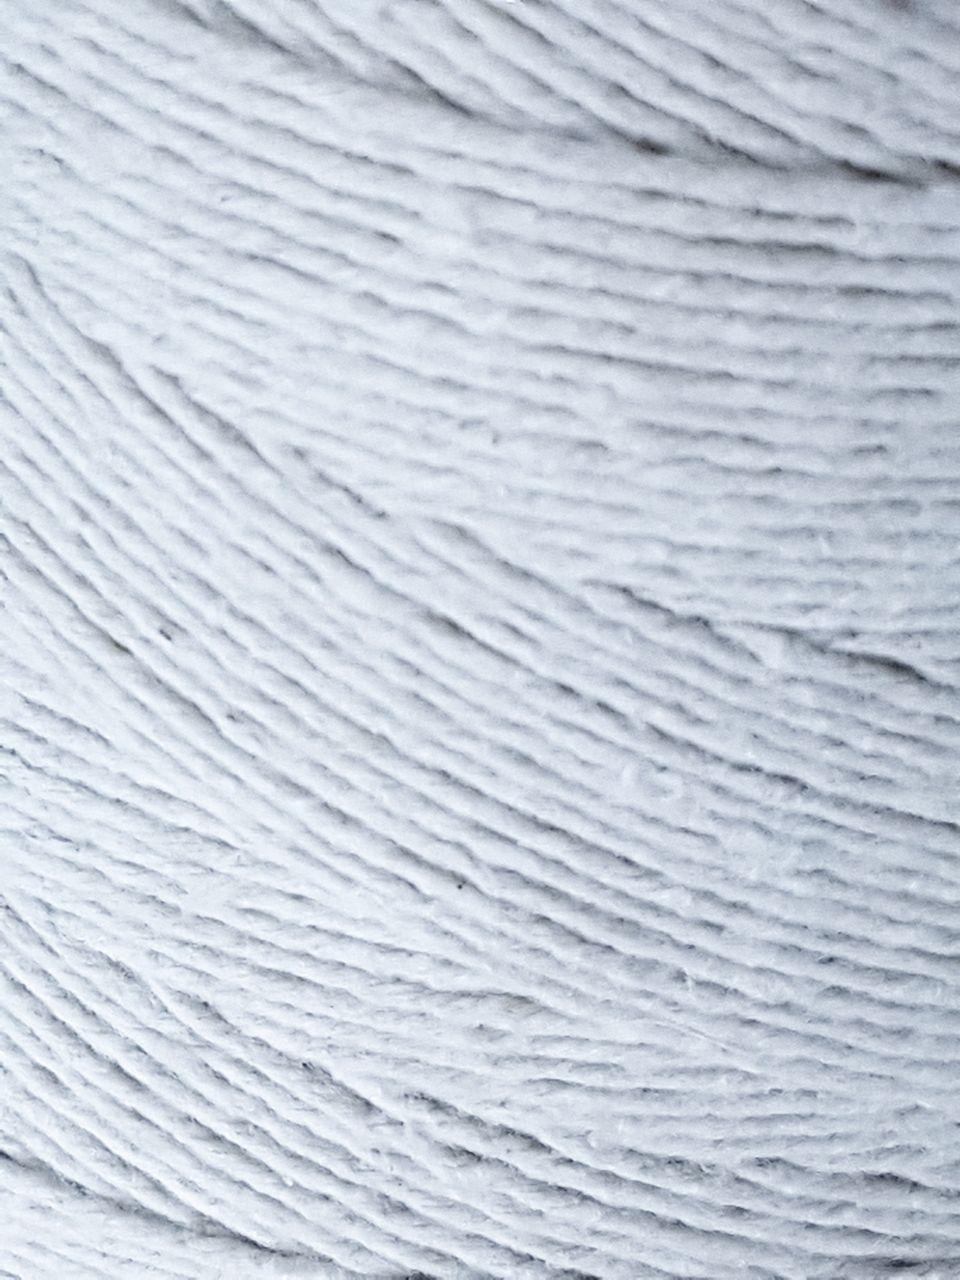 Barbante Fio 6 1kg Cru Croch Artesanato Tapete 600m Loja